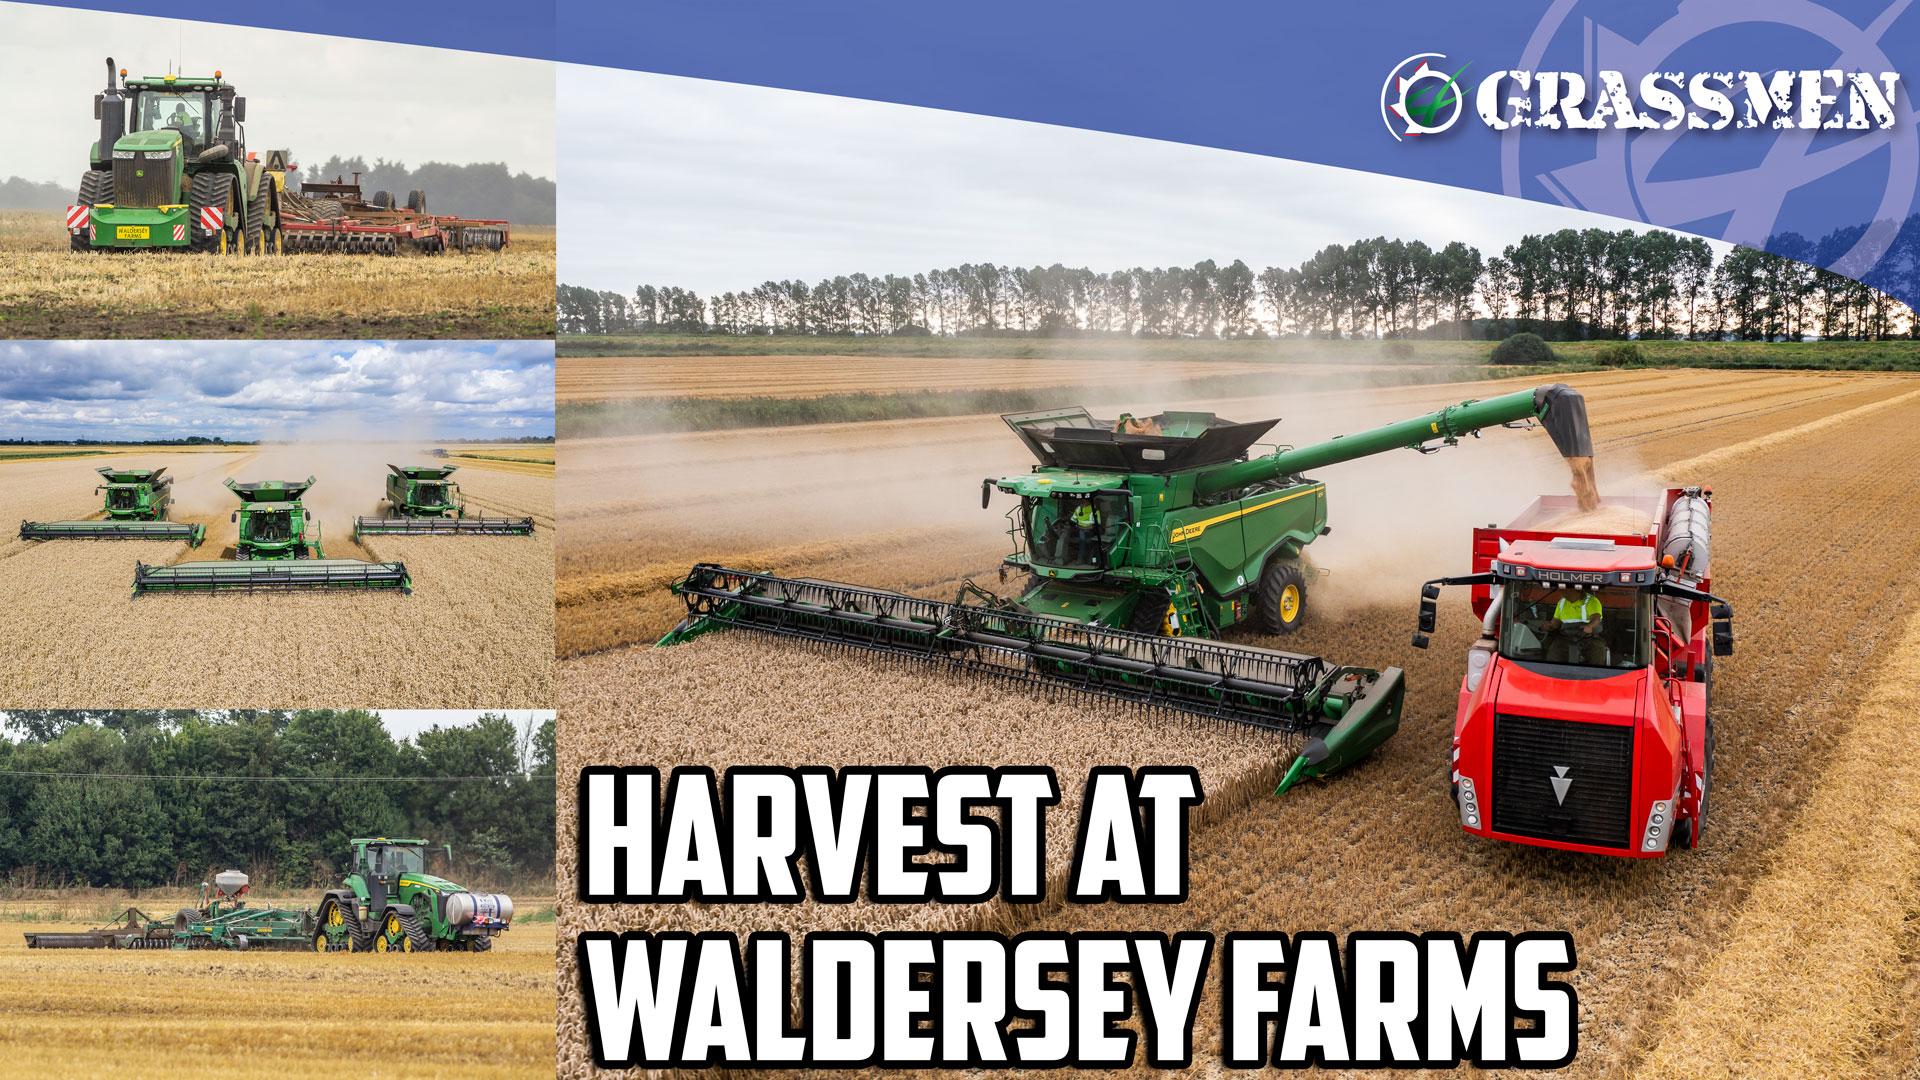 Harvest at Waldersey Farms!